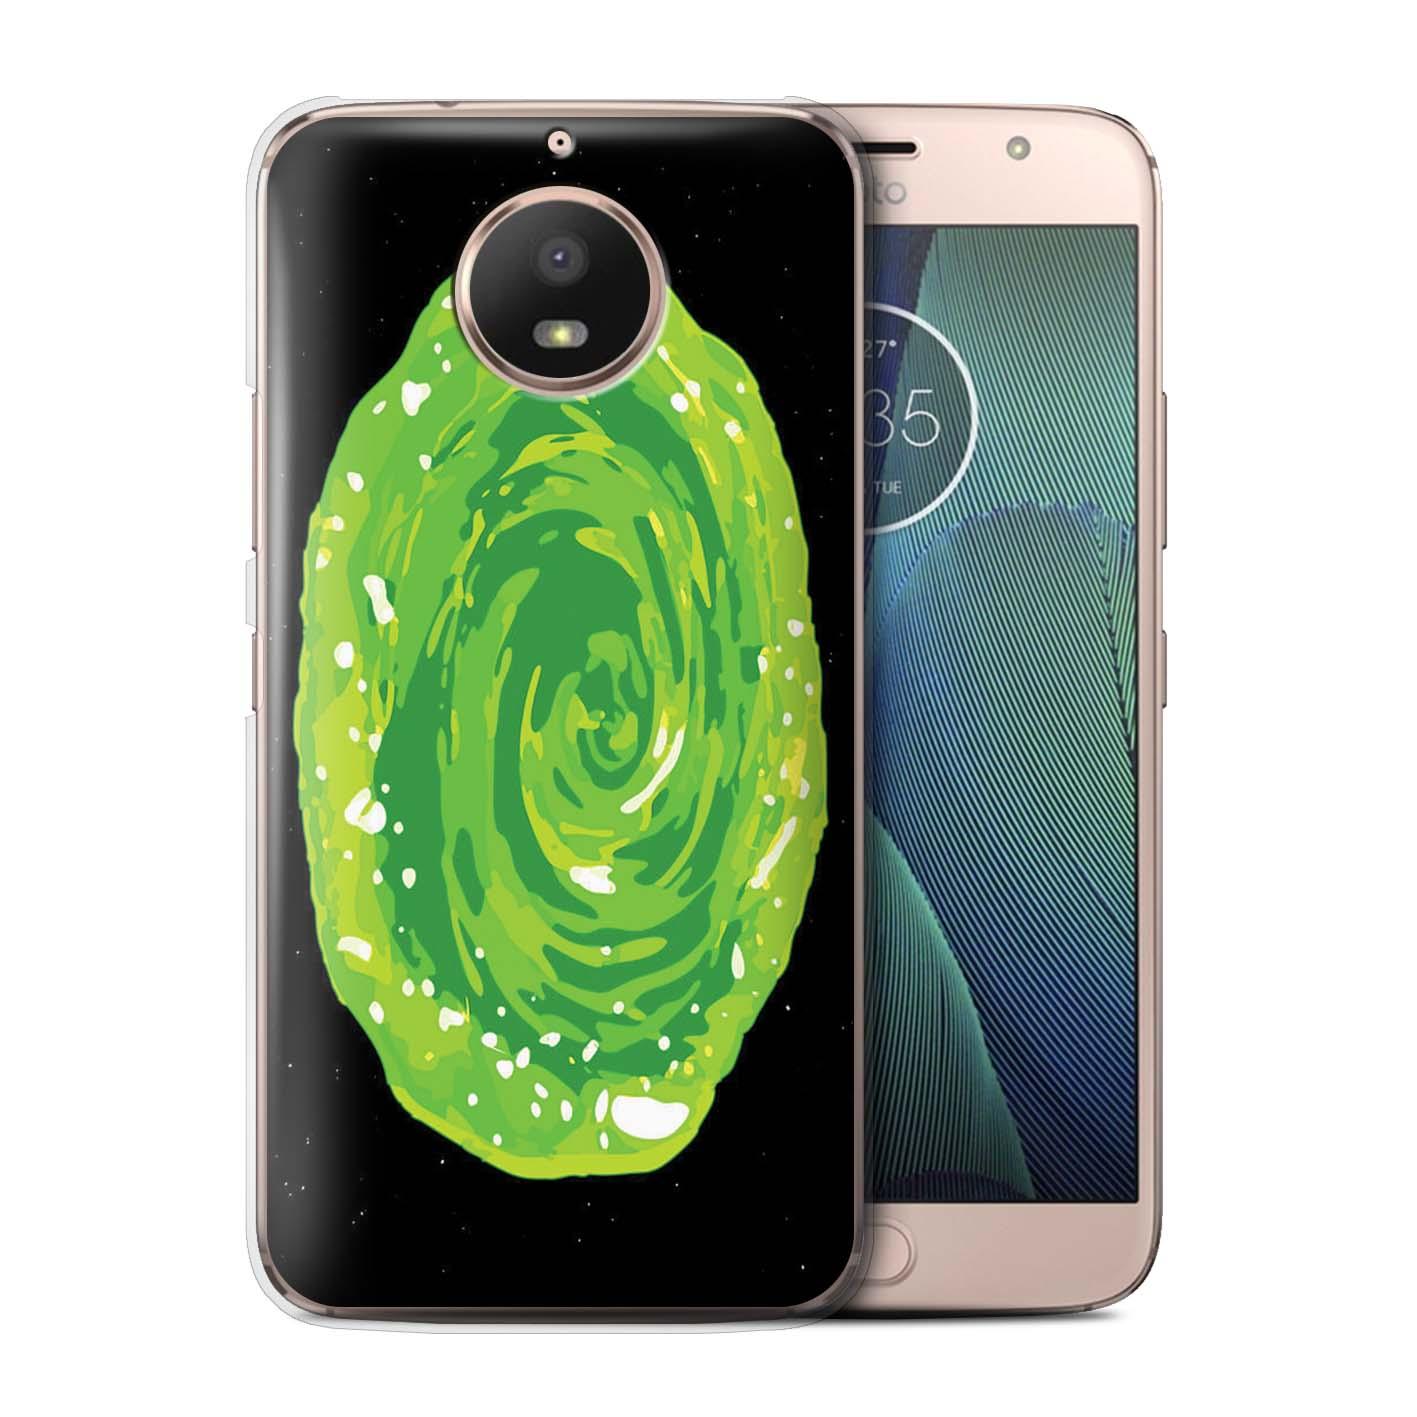 Coque-Etui-Housse-de-Stuff4-pour-Motorola-Moto-G5S-Tele-Alien-Drole-Dessin-Anime